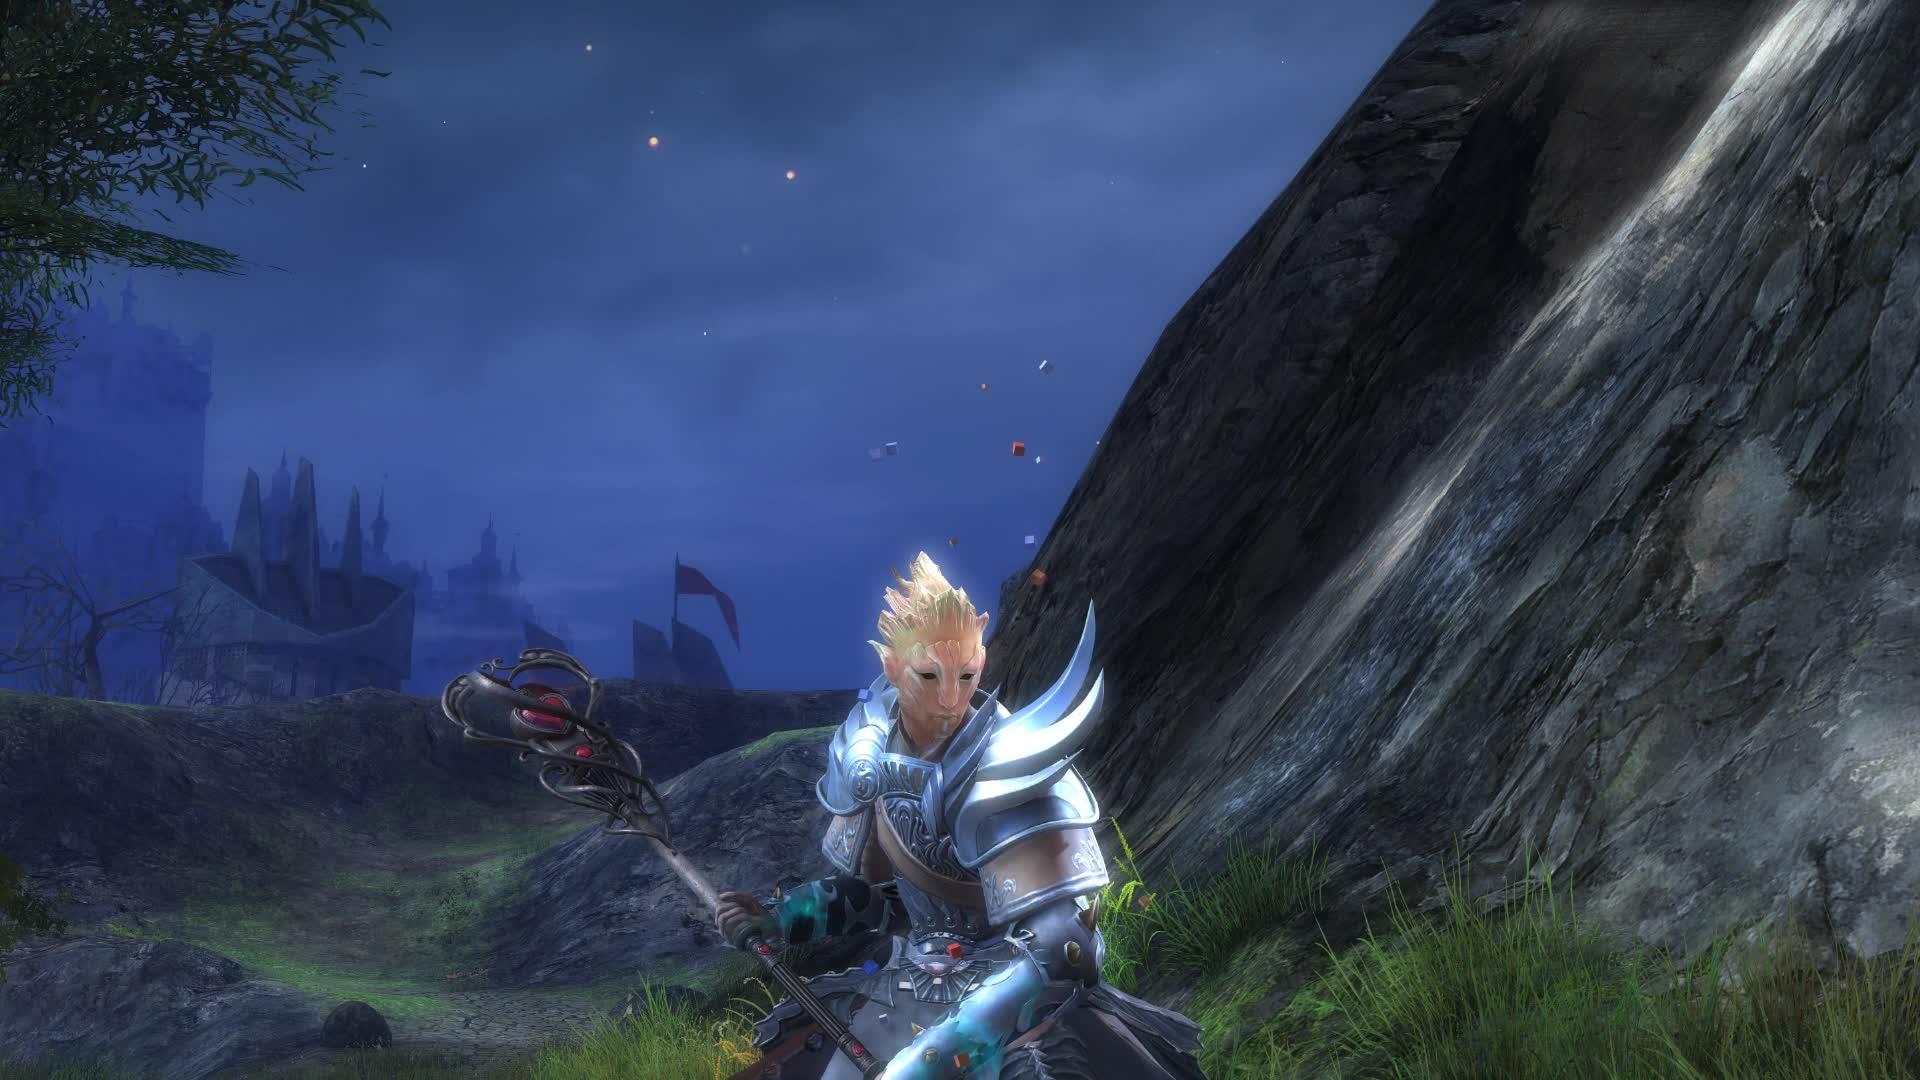 guildwars2, Guild Wars 2 2018.11.08 - 21.43.12.03 GIFs